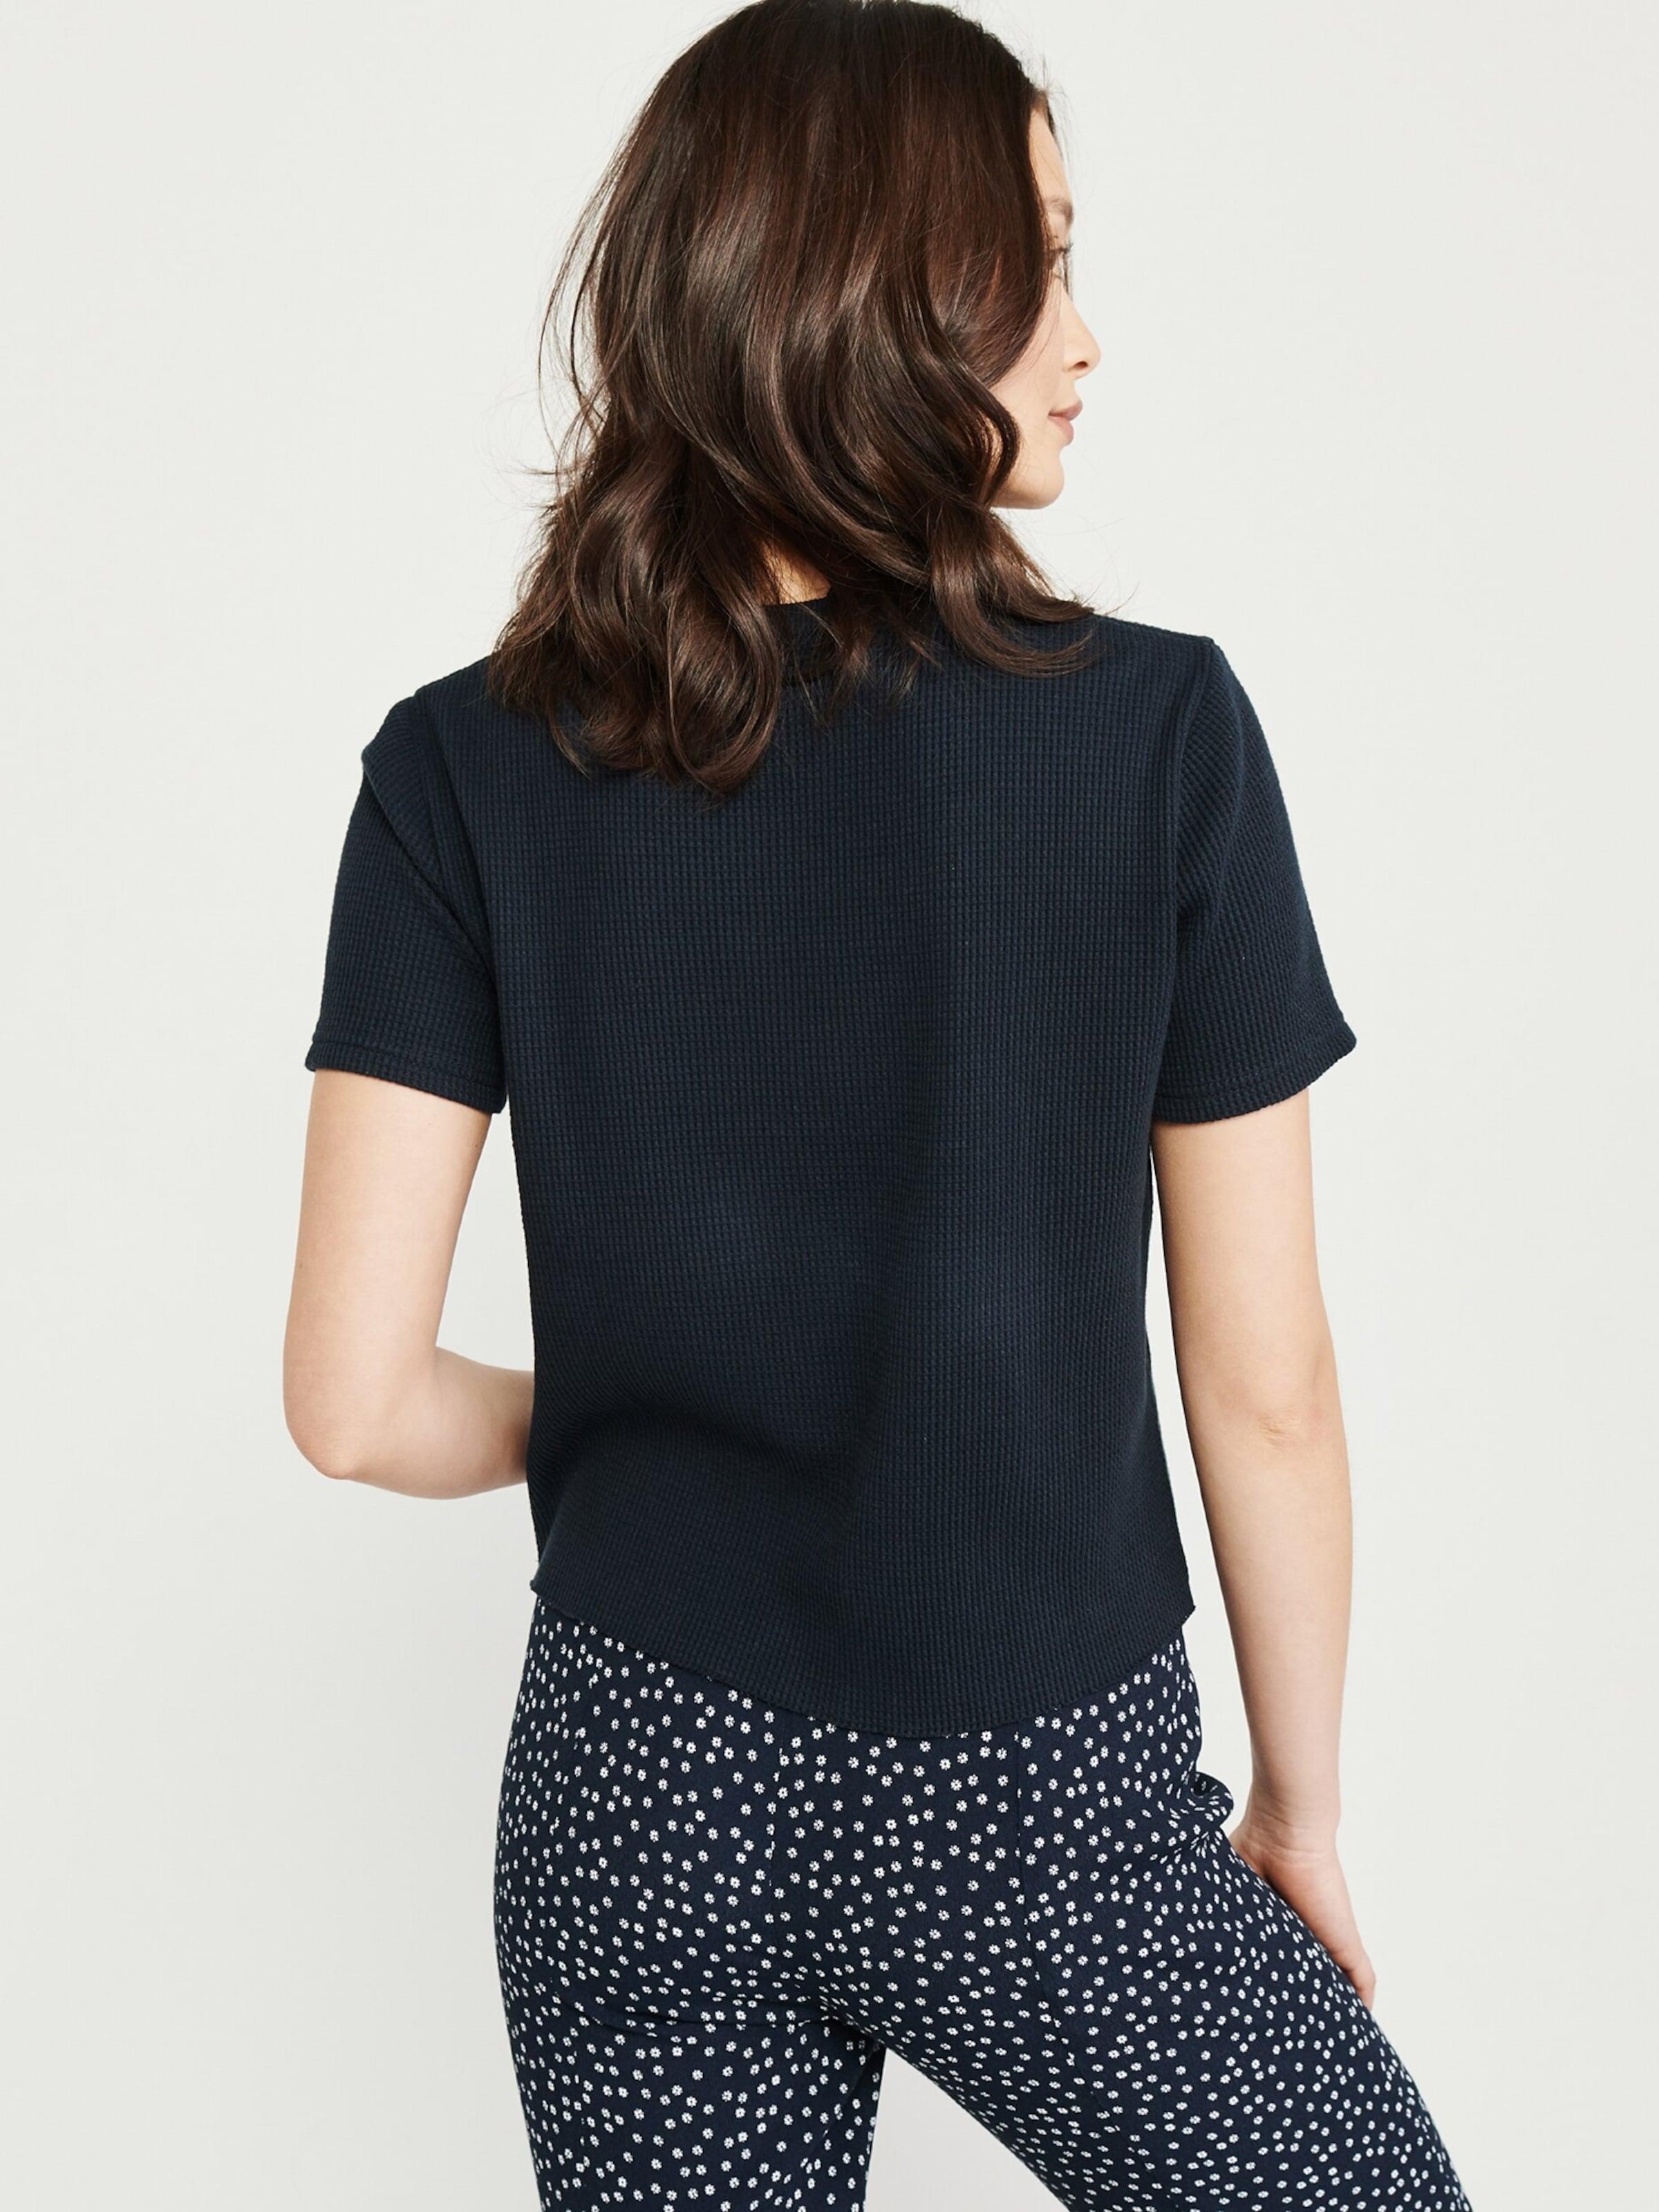 Logo 'waffle Abercrombieamp; shirt Tee' MarineBlanc Fitch En T Bleu rxedBCo